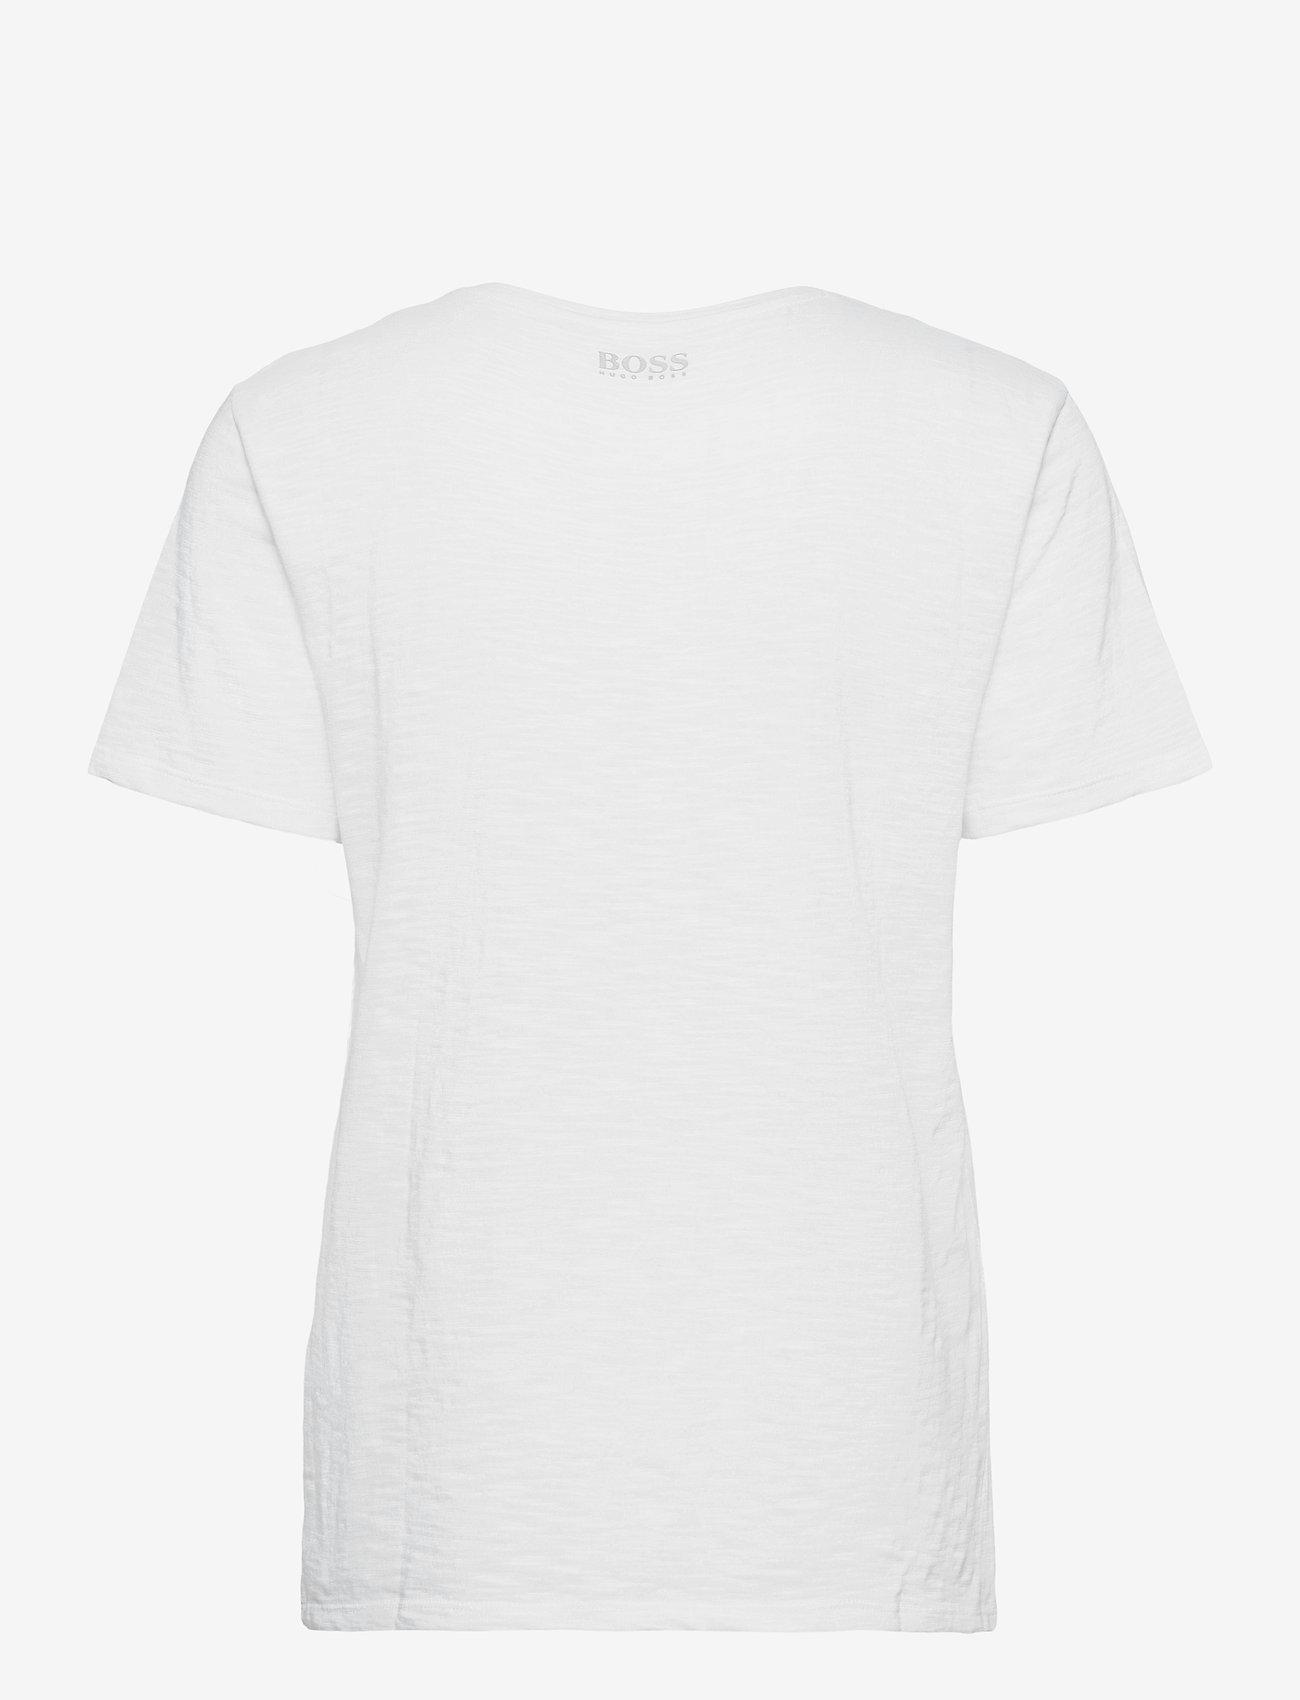 BOSS - C_Emodern - t-shirts - white - 1